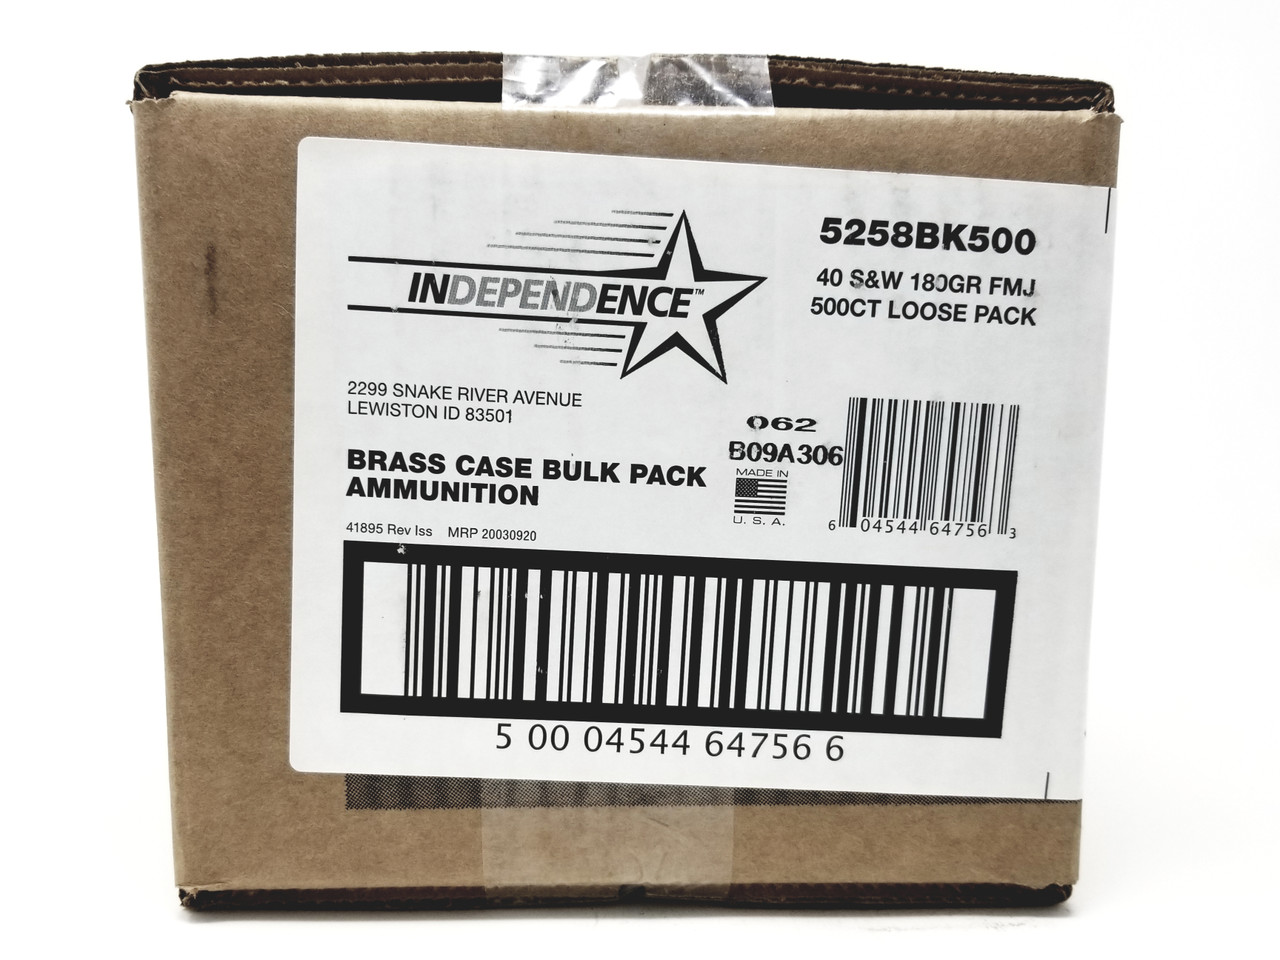 40 S&W Ammo For Sale | Bulk  40 S&W Ammo- Bulk Cheap Ammo